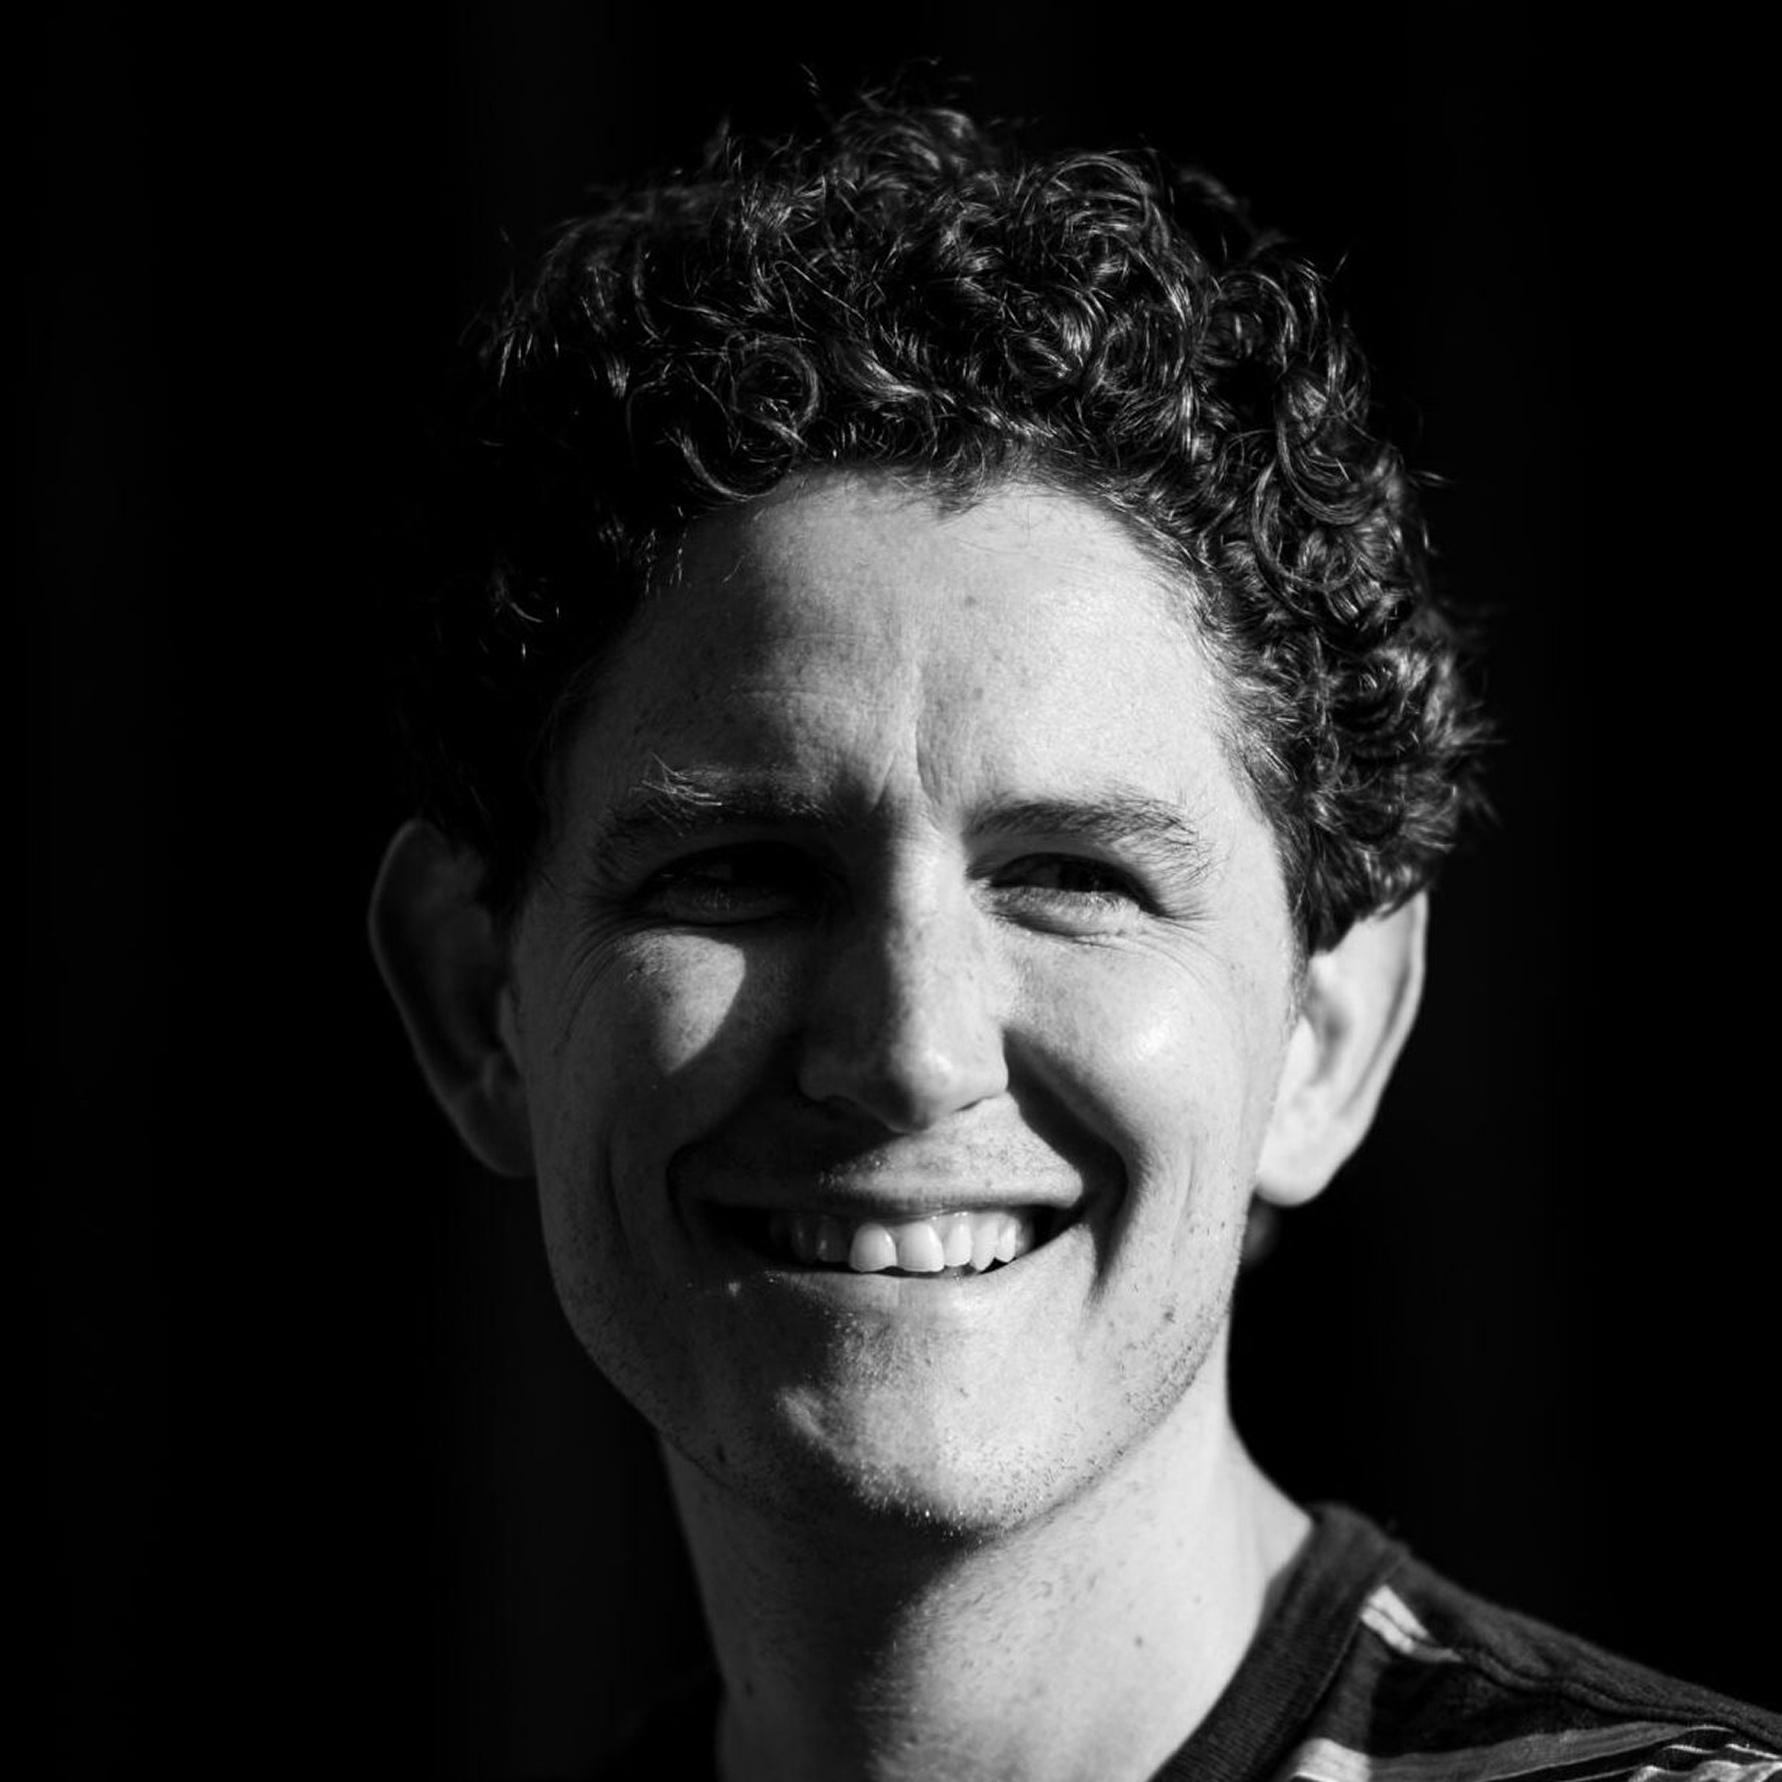 Joe Cork, Rumble VFX founder